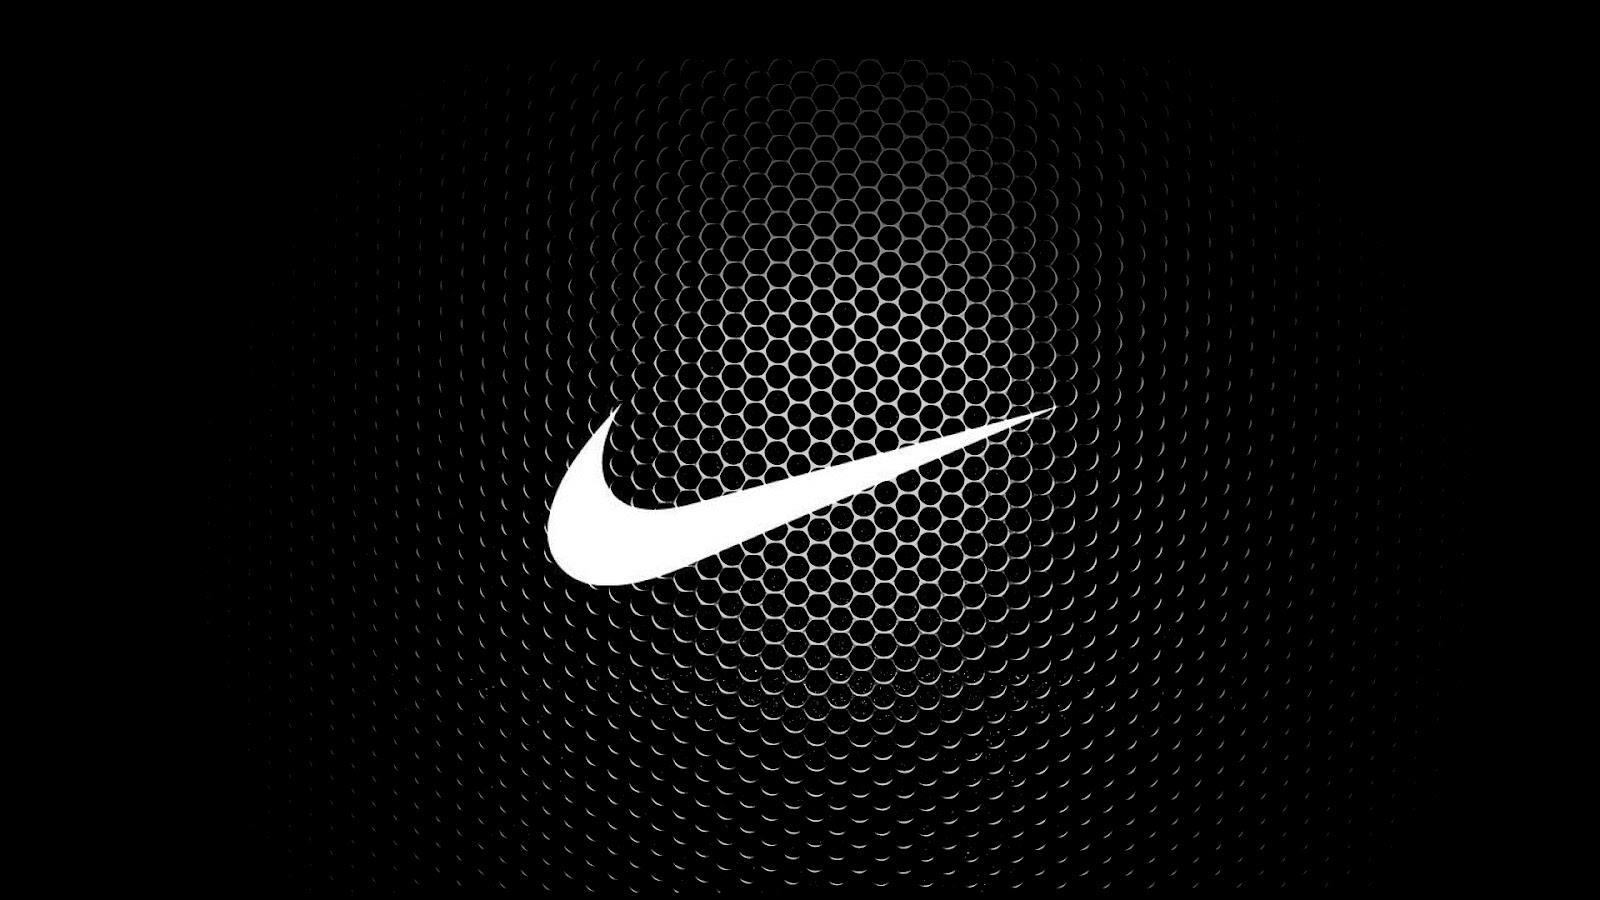 Nike Logo Exclusive HD Wallpapers 3373 1600x900